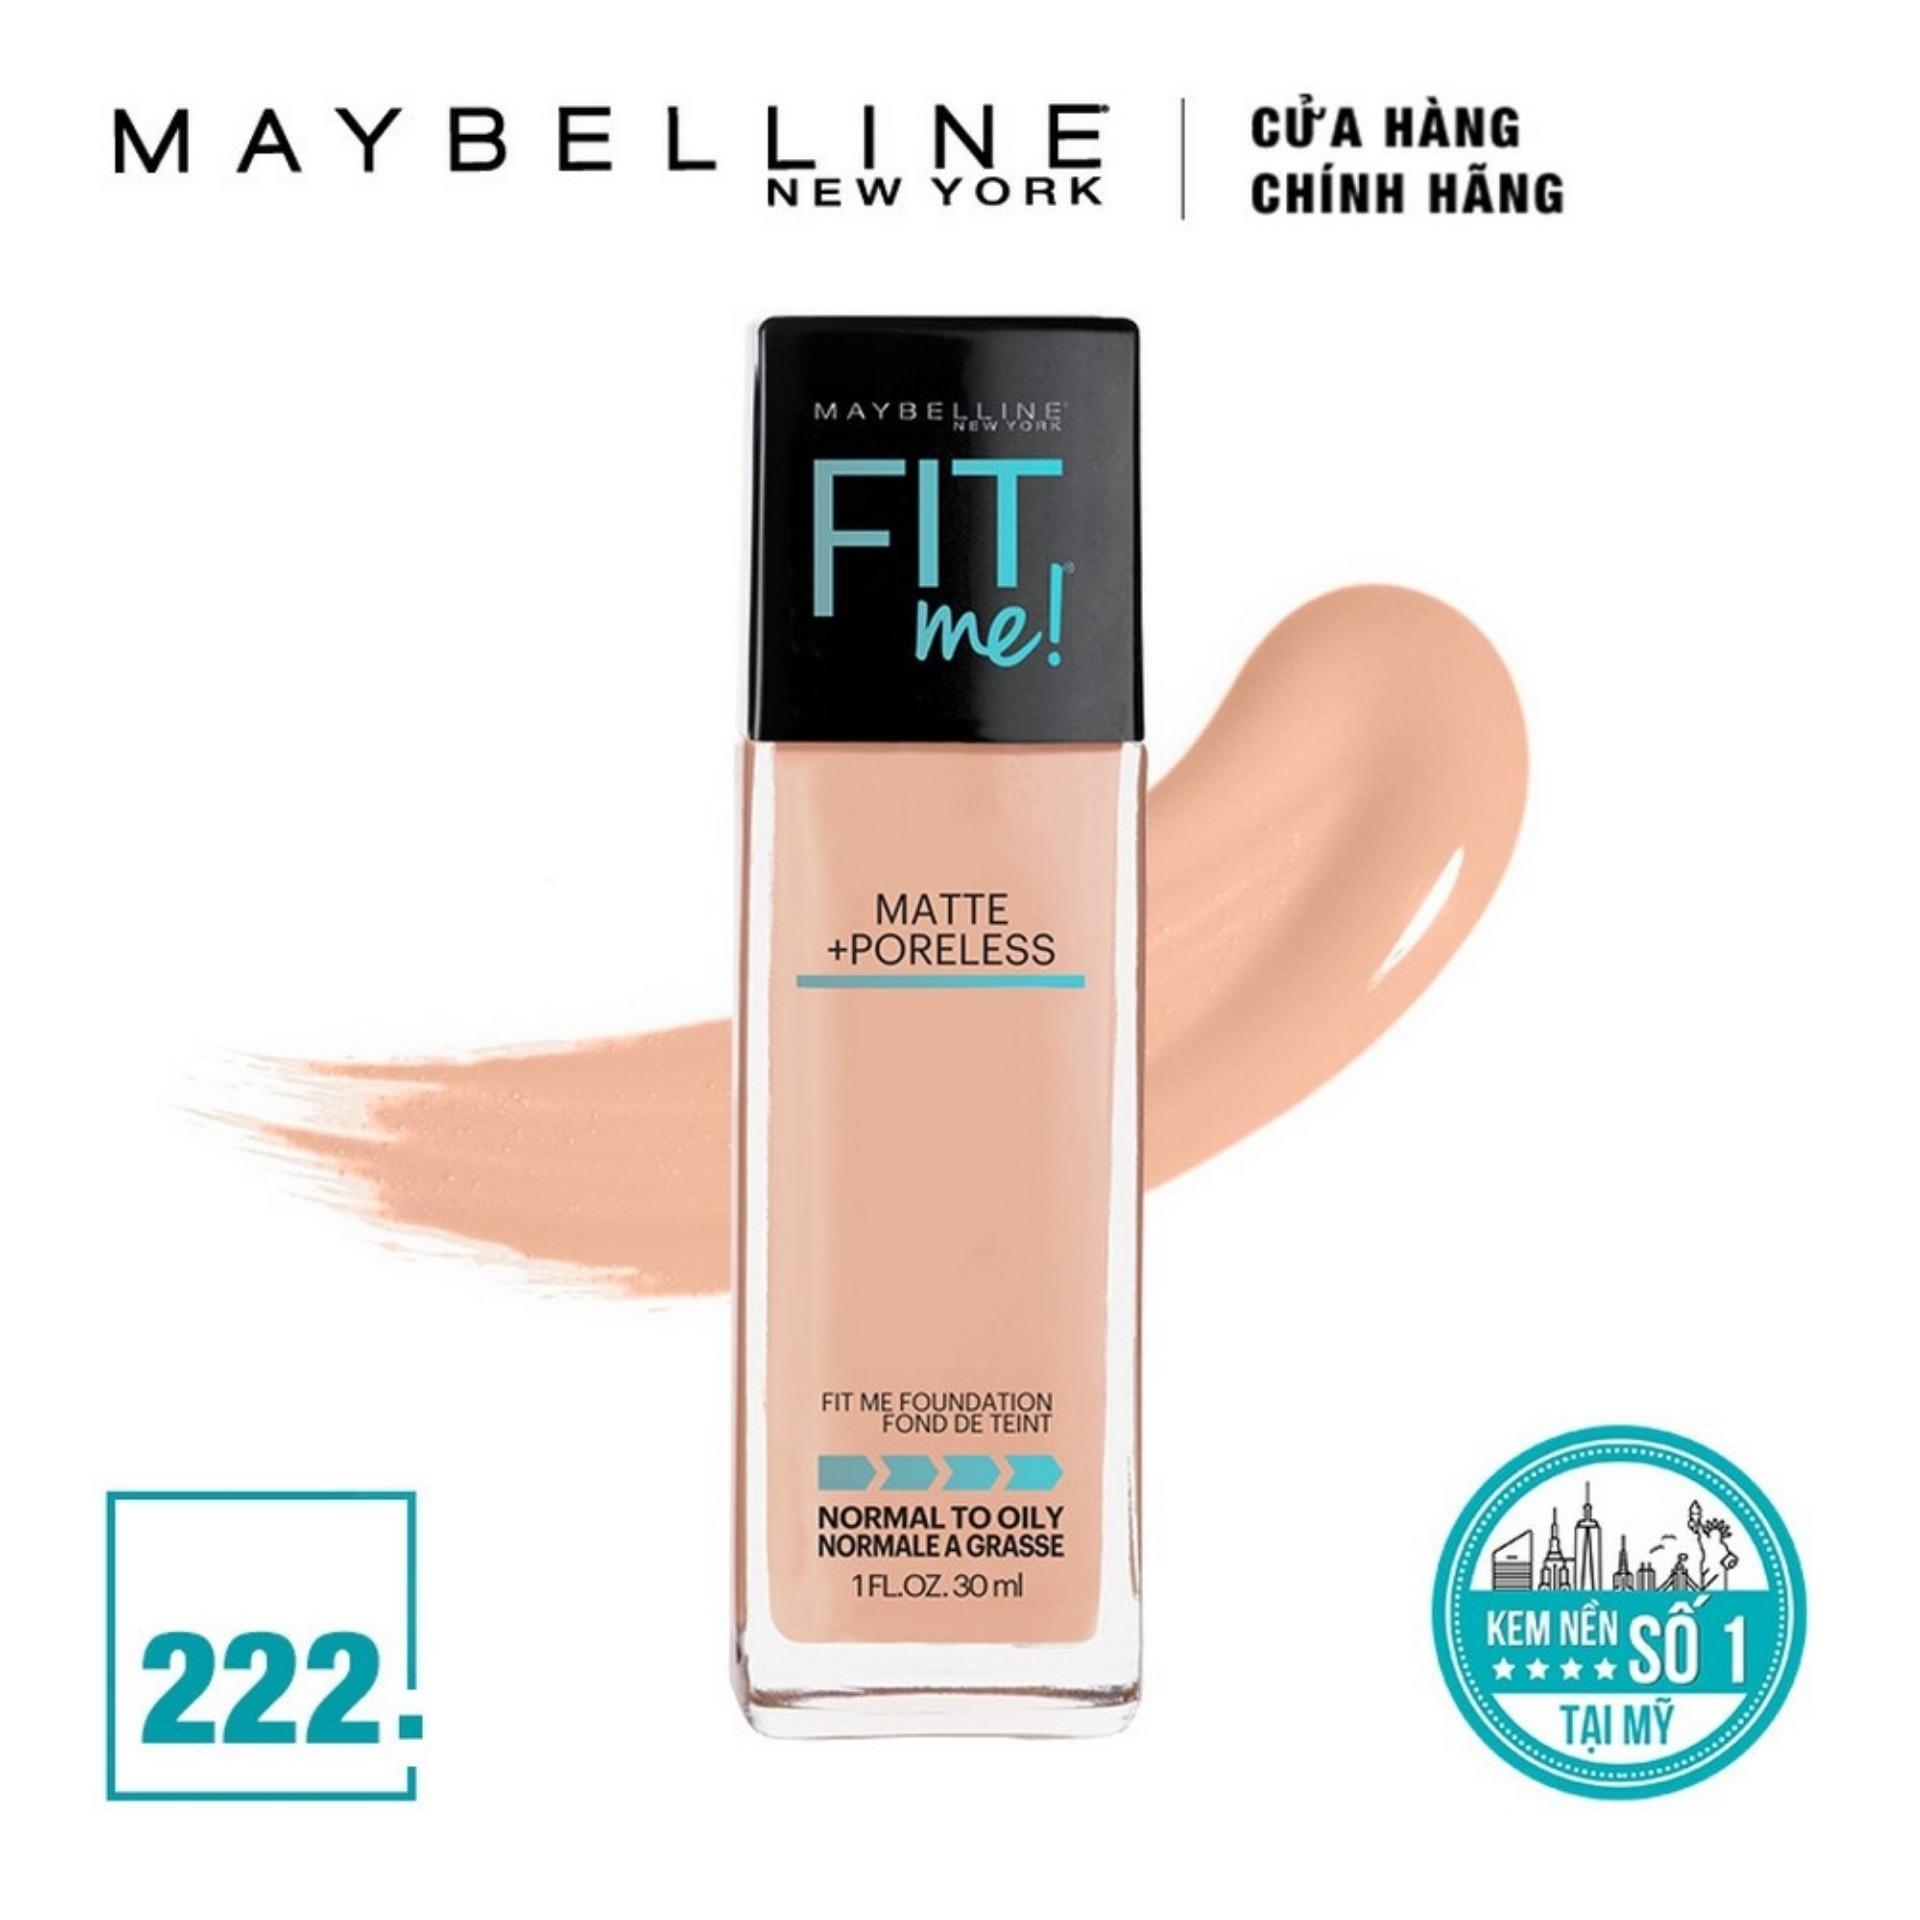 Kem Nền Lì Tự Nhiên Maybelline New York Fit Me Matte Poreless Foundation 30ml nhập khẩu